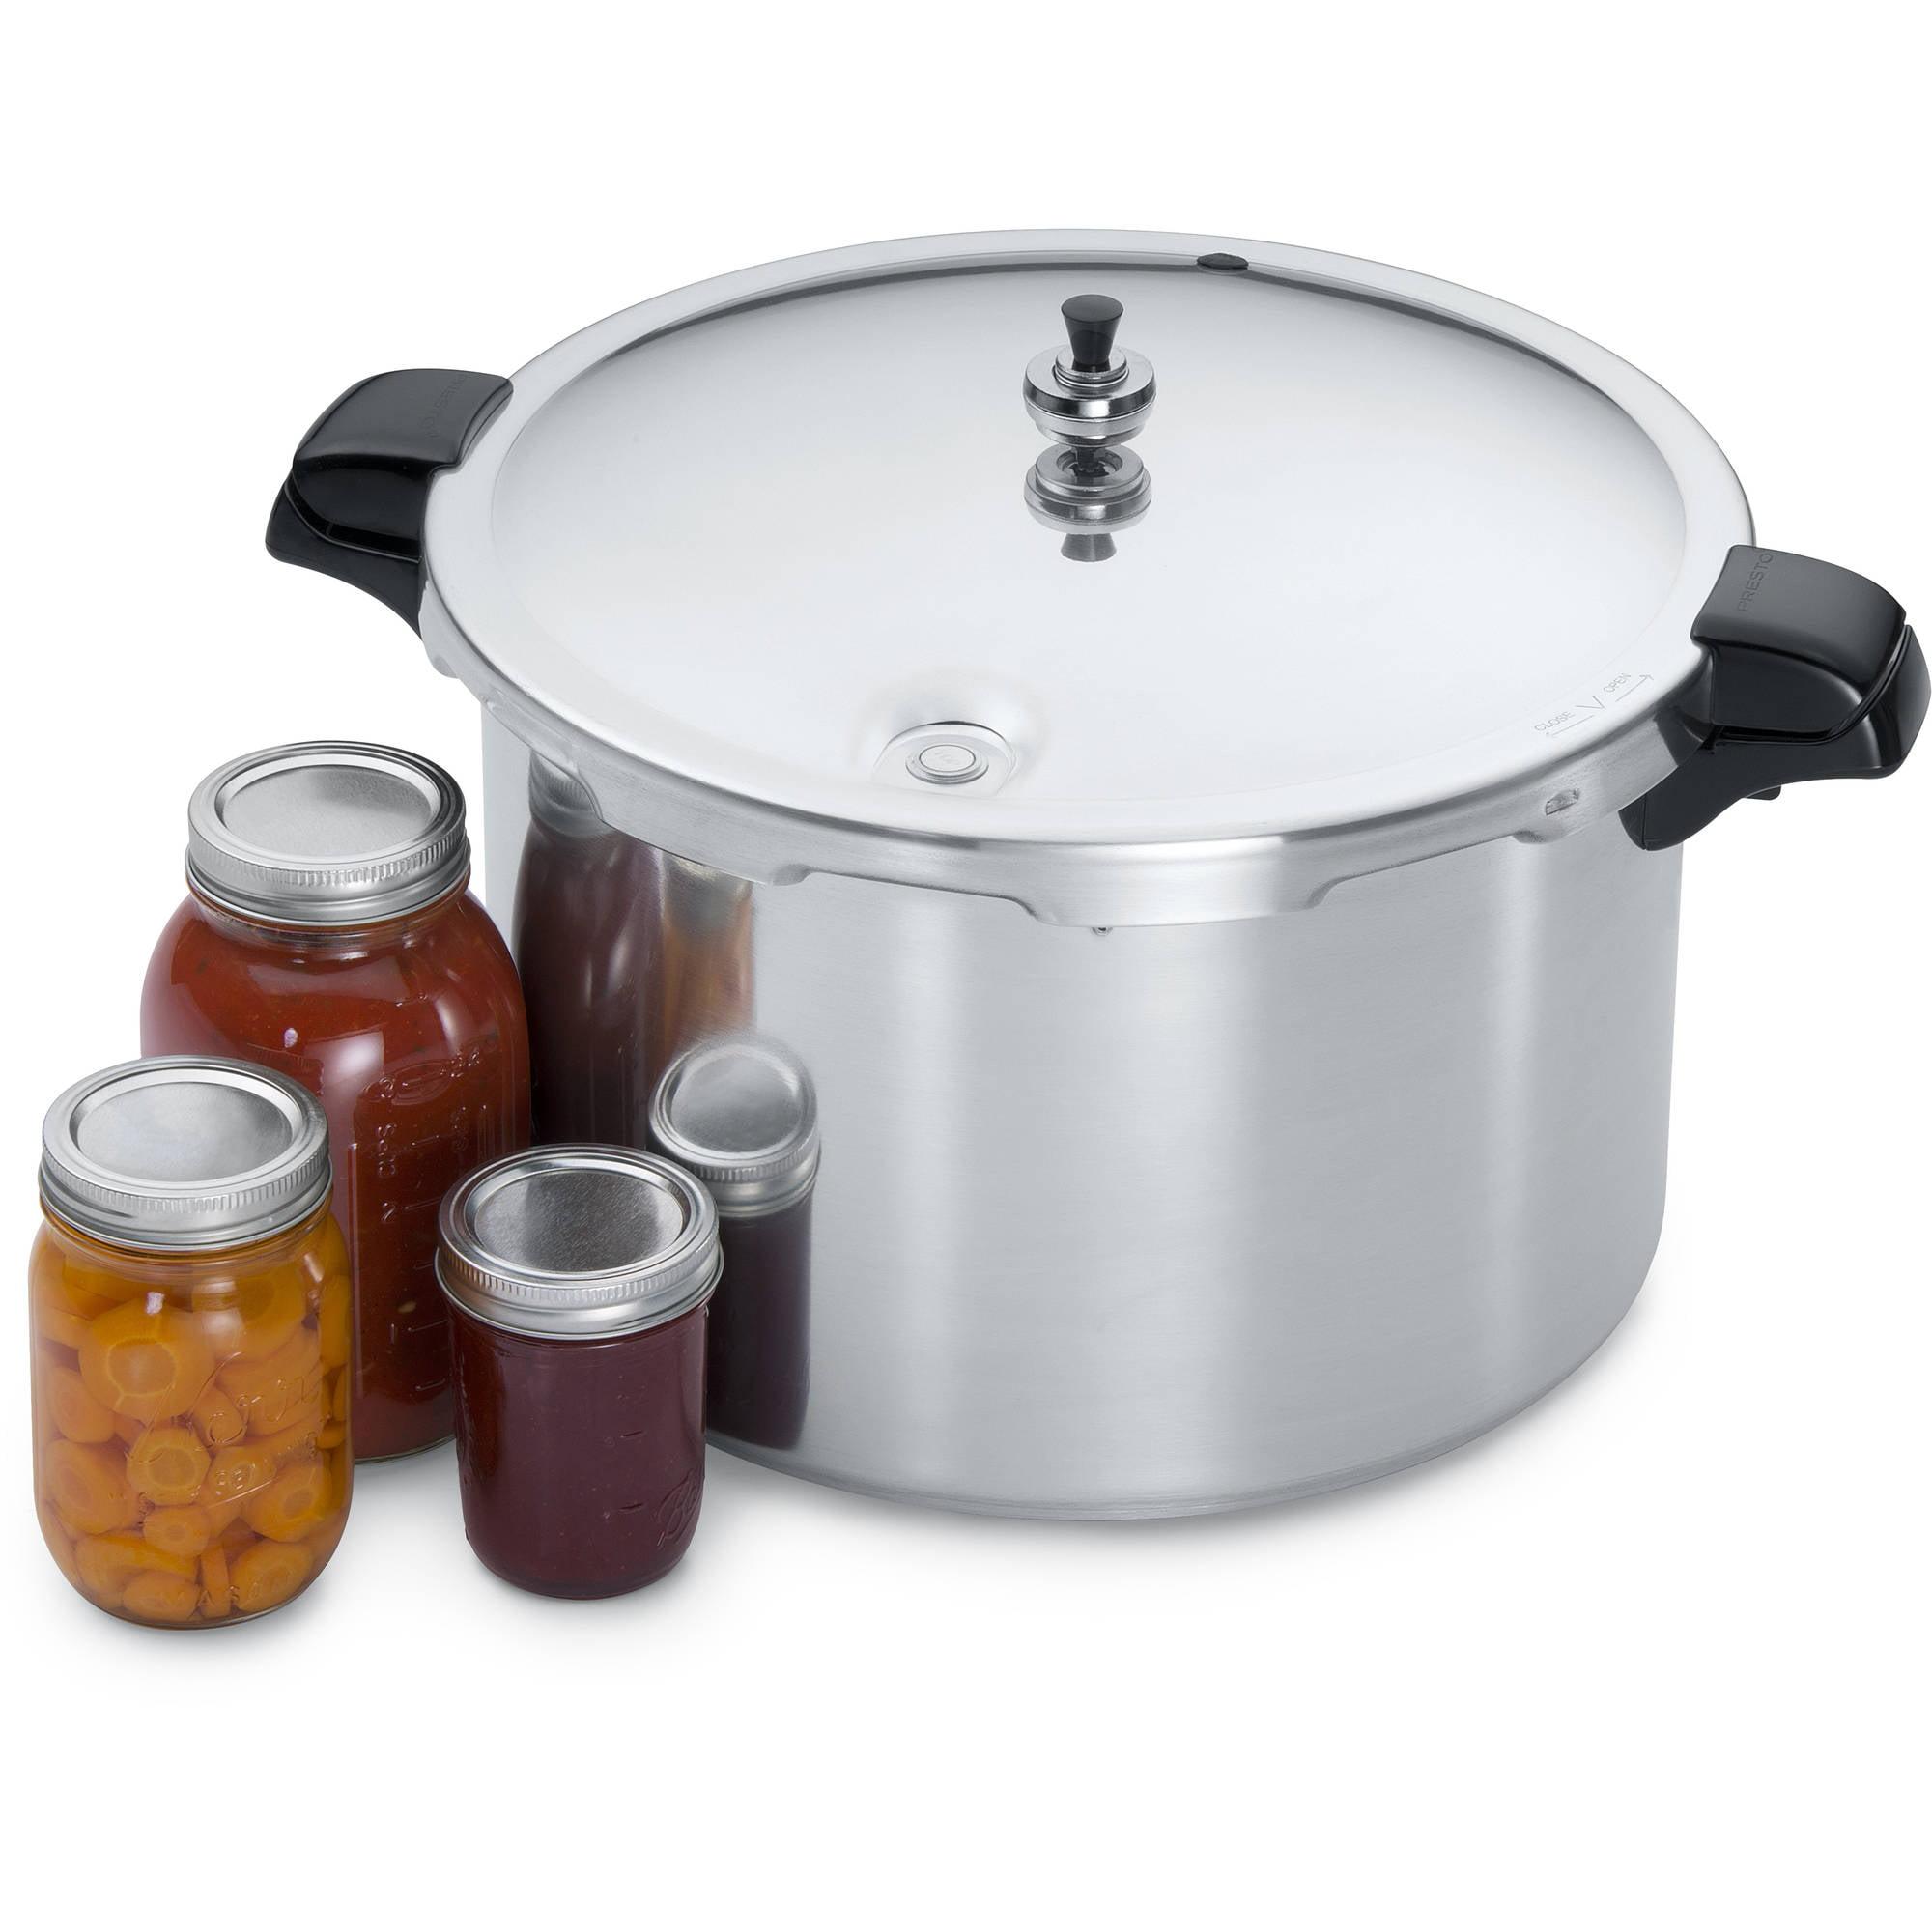 Presto 16-Quart Pressure Canner and Cooker 01745